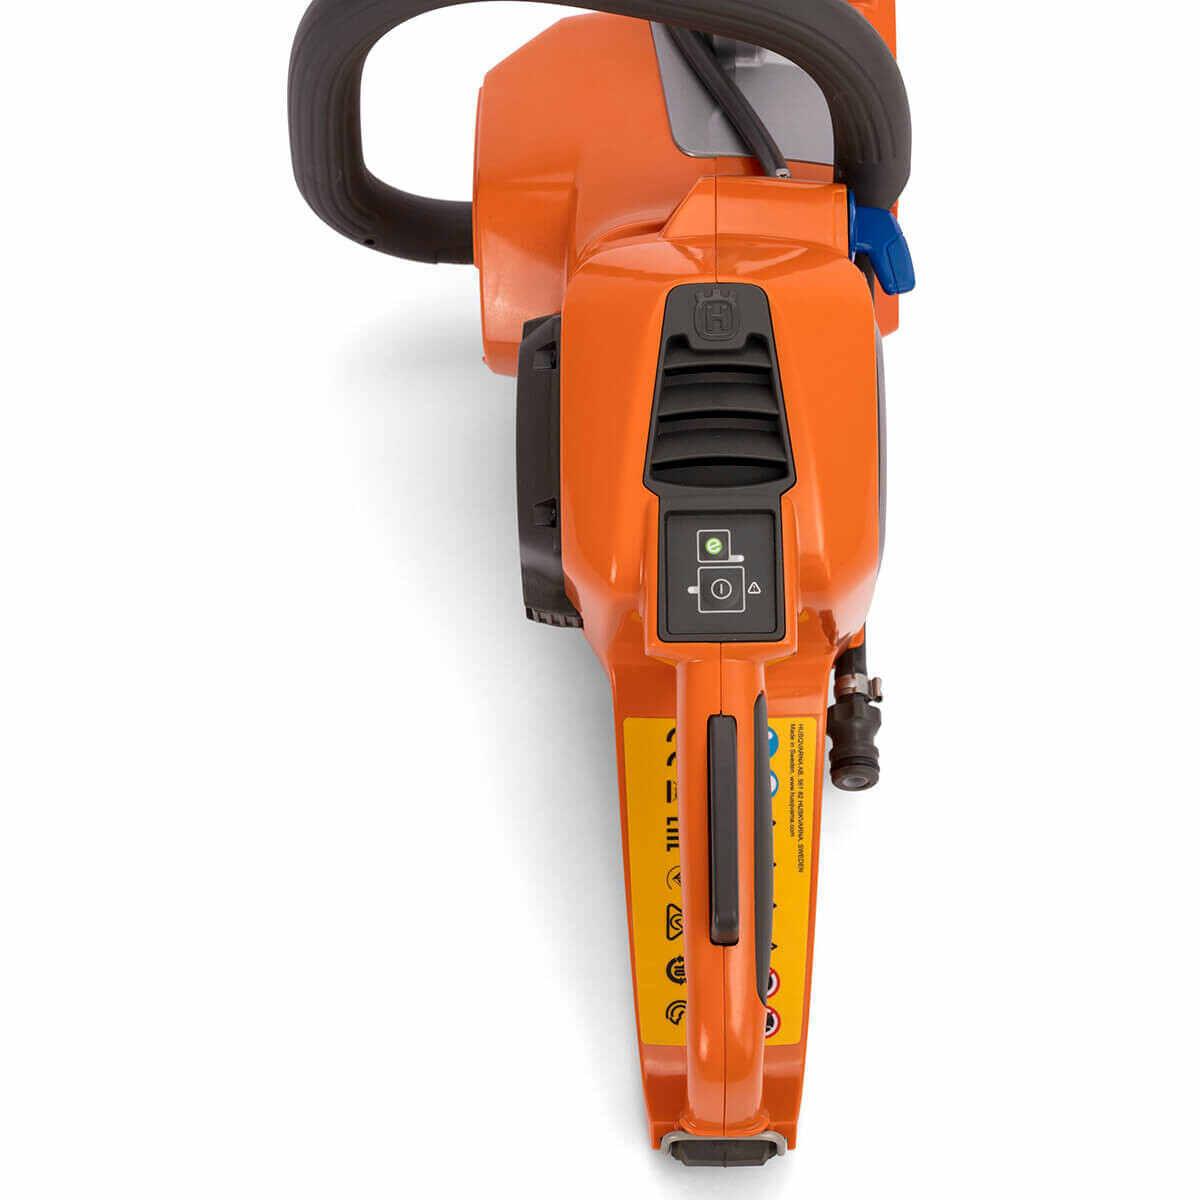 Husqvarna K535i Cut-Off Saw Handle